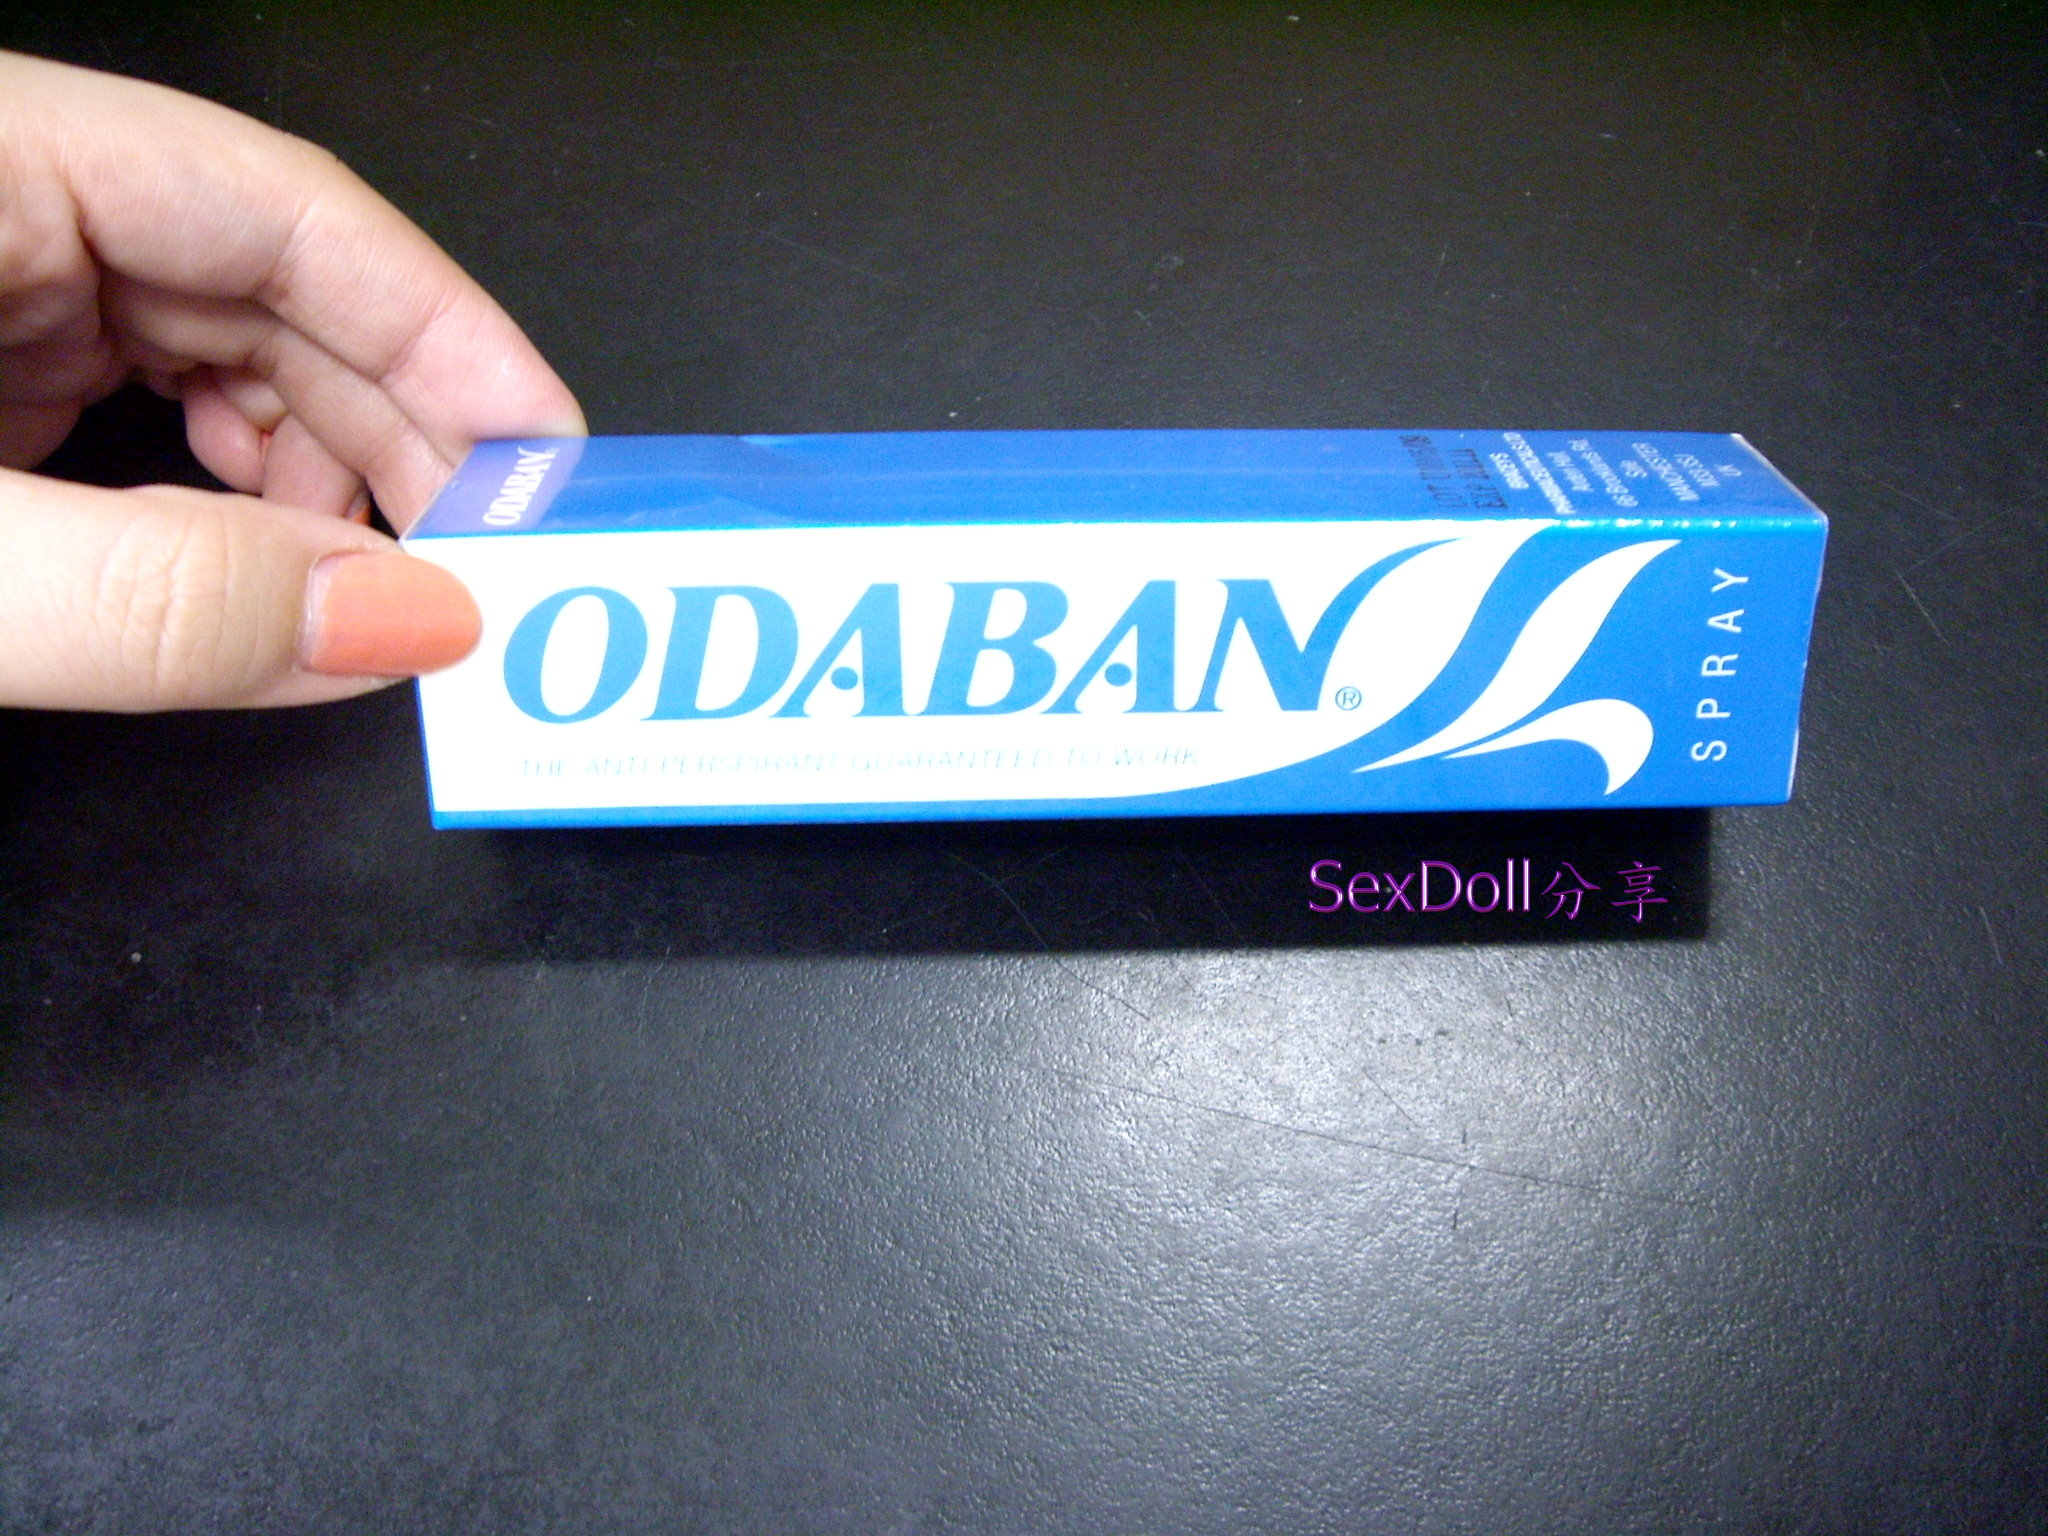 ODABAN.jpg